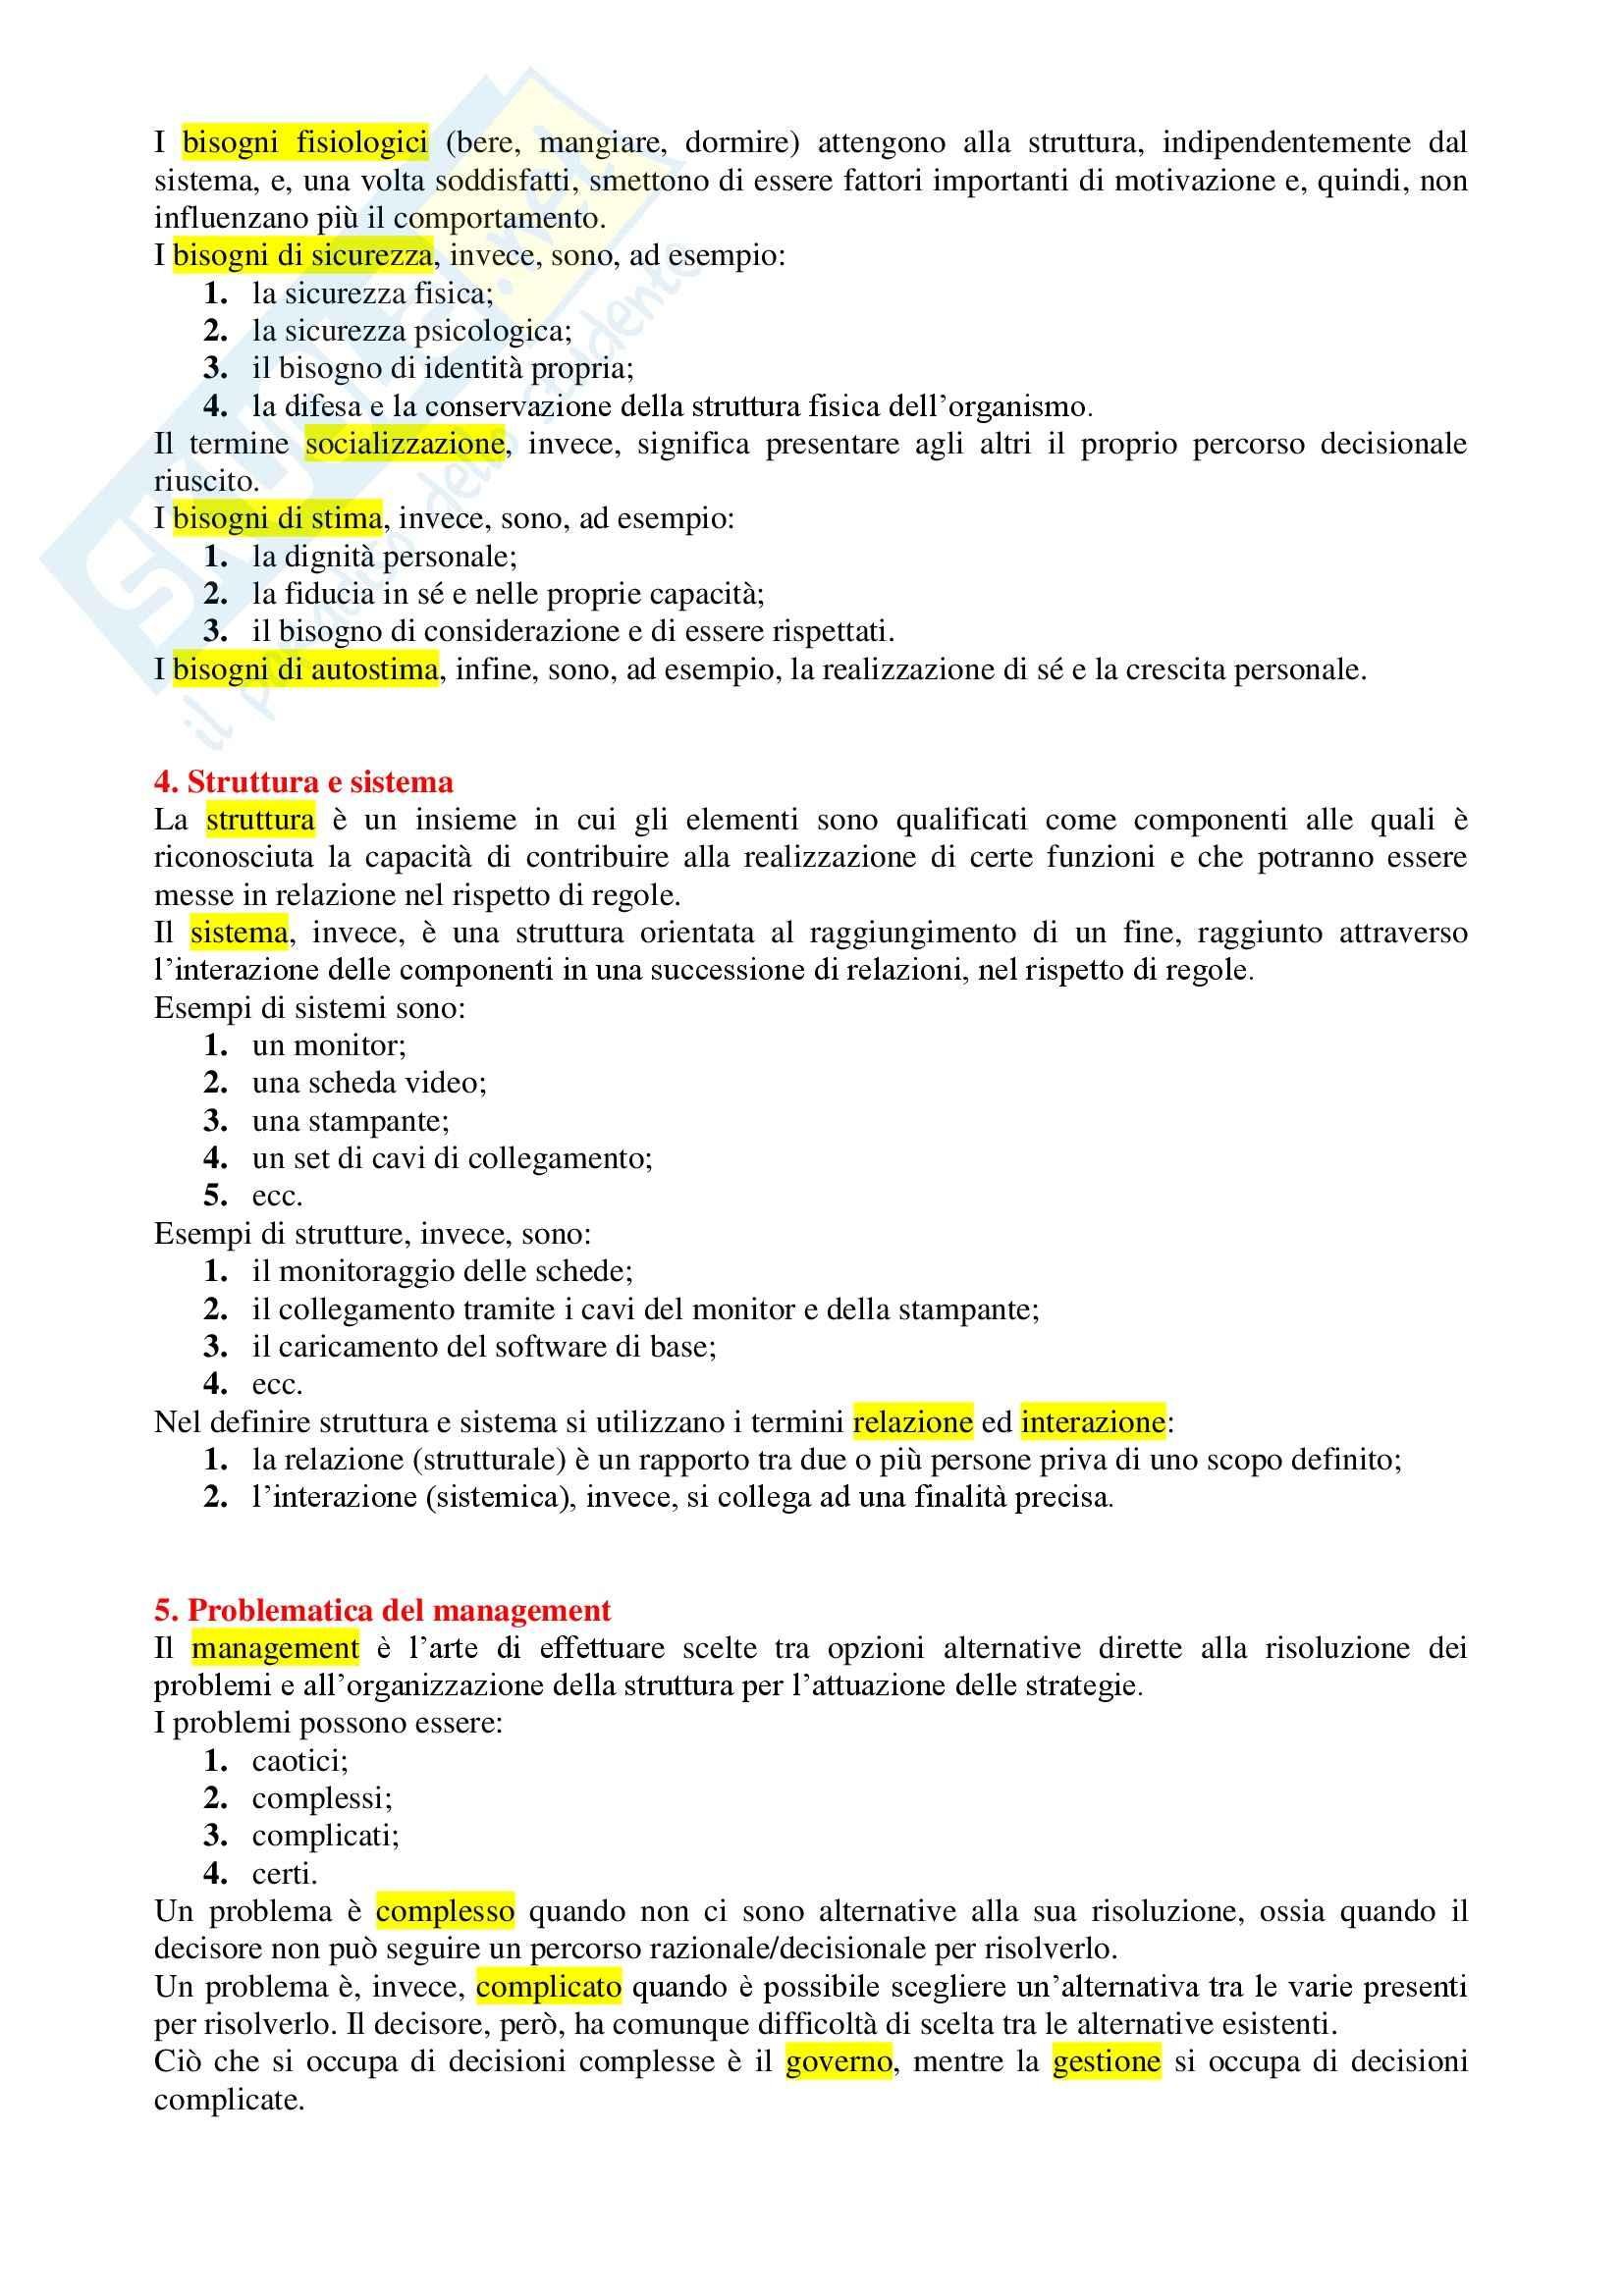 Fondamenti di Management - Appunti Pag. 2